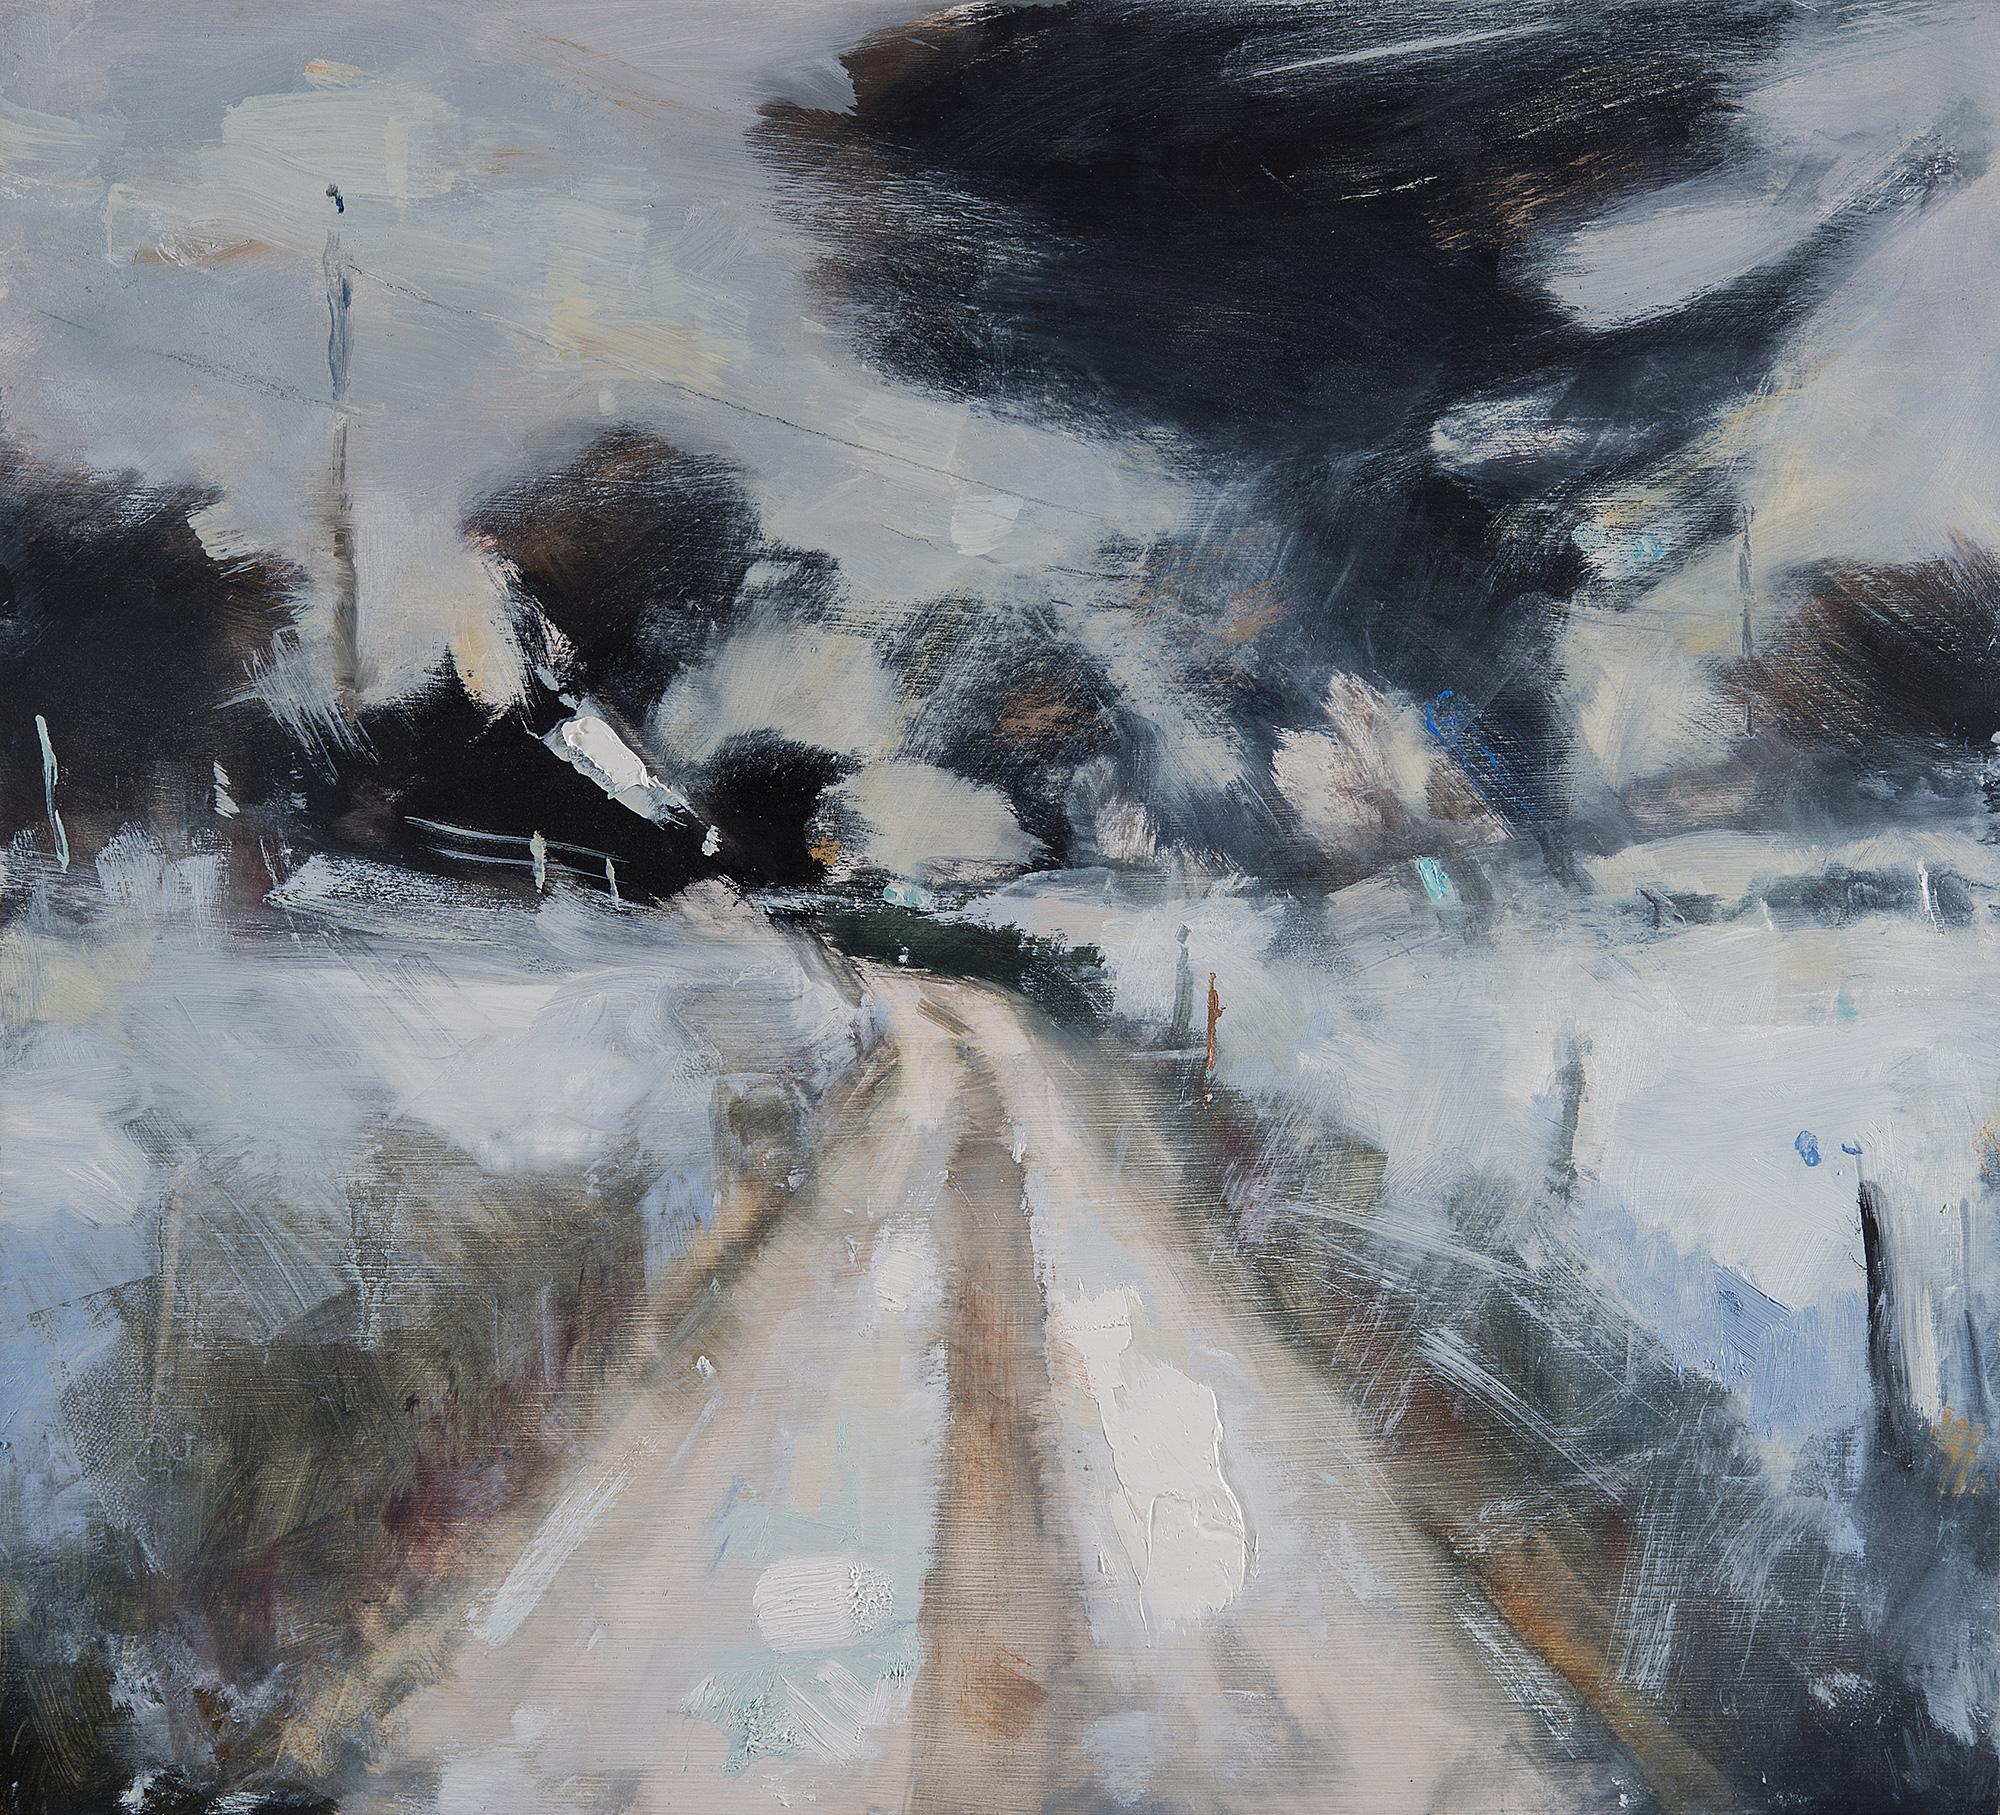 Snowfall,Devon Lane.  Oil on board.50 x 55cm  Sold